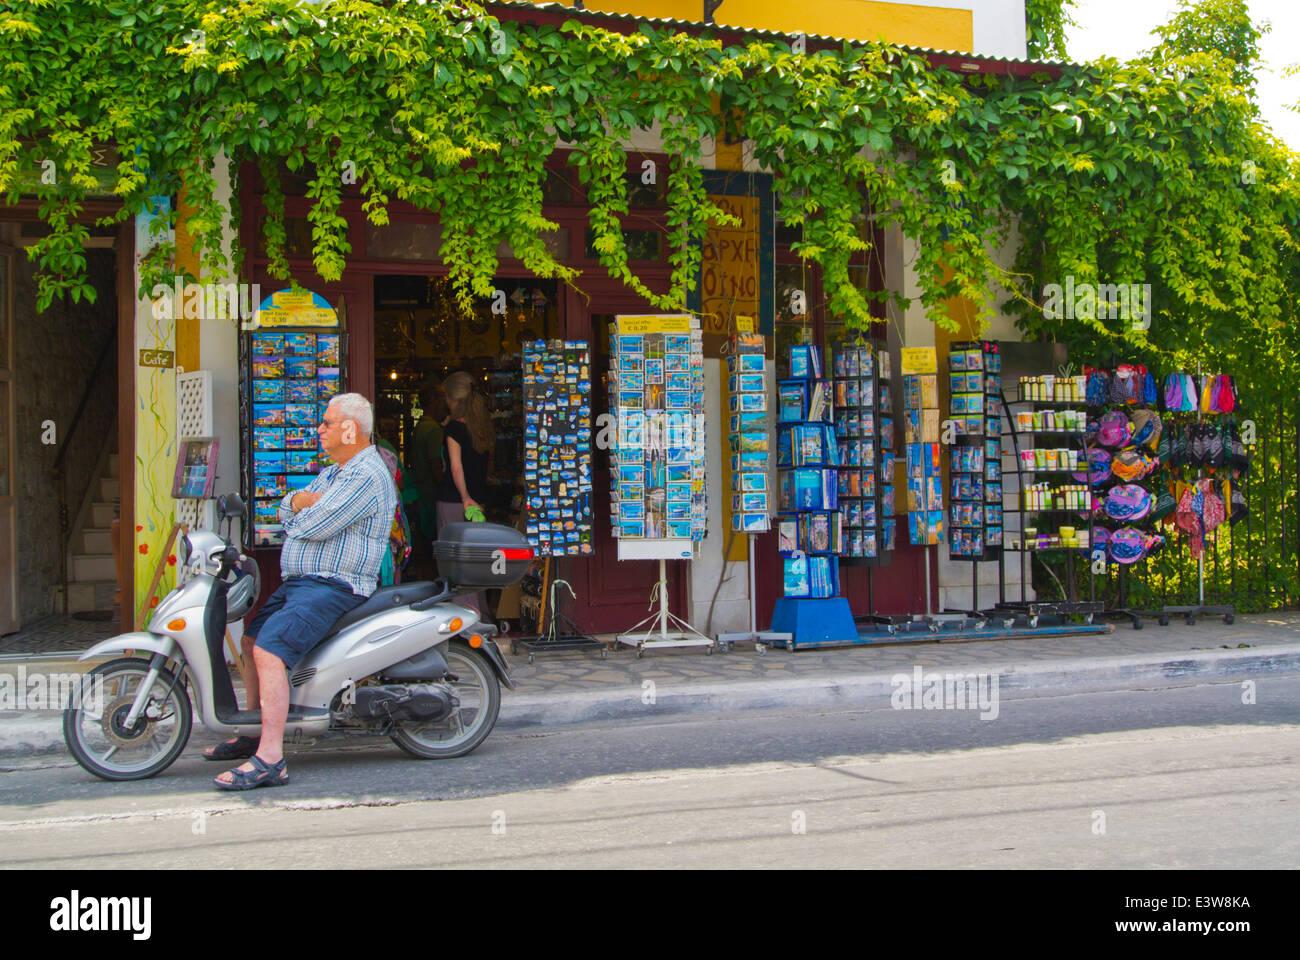 Local man on scooter outside souvenir shop, Logotheti street, Pythagoreio, Samos, Greece, Europe Stock Photo